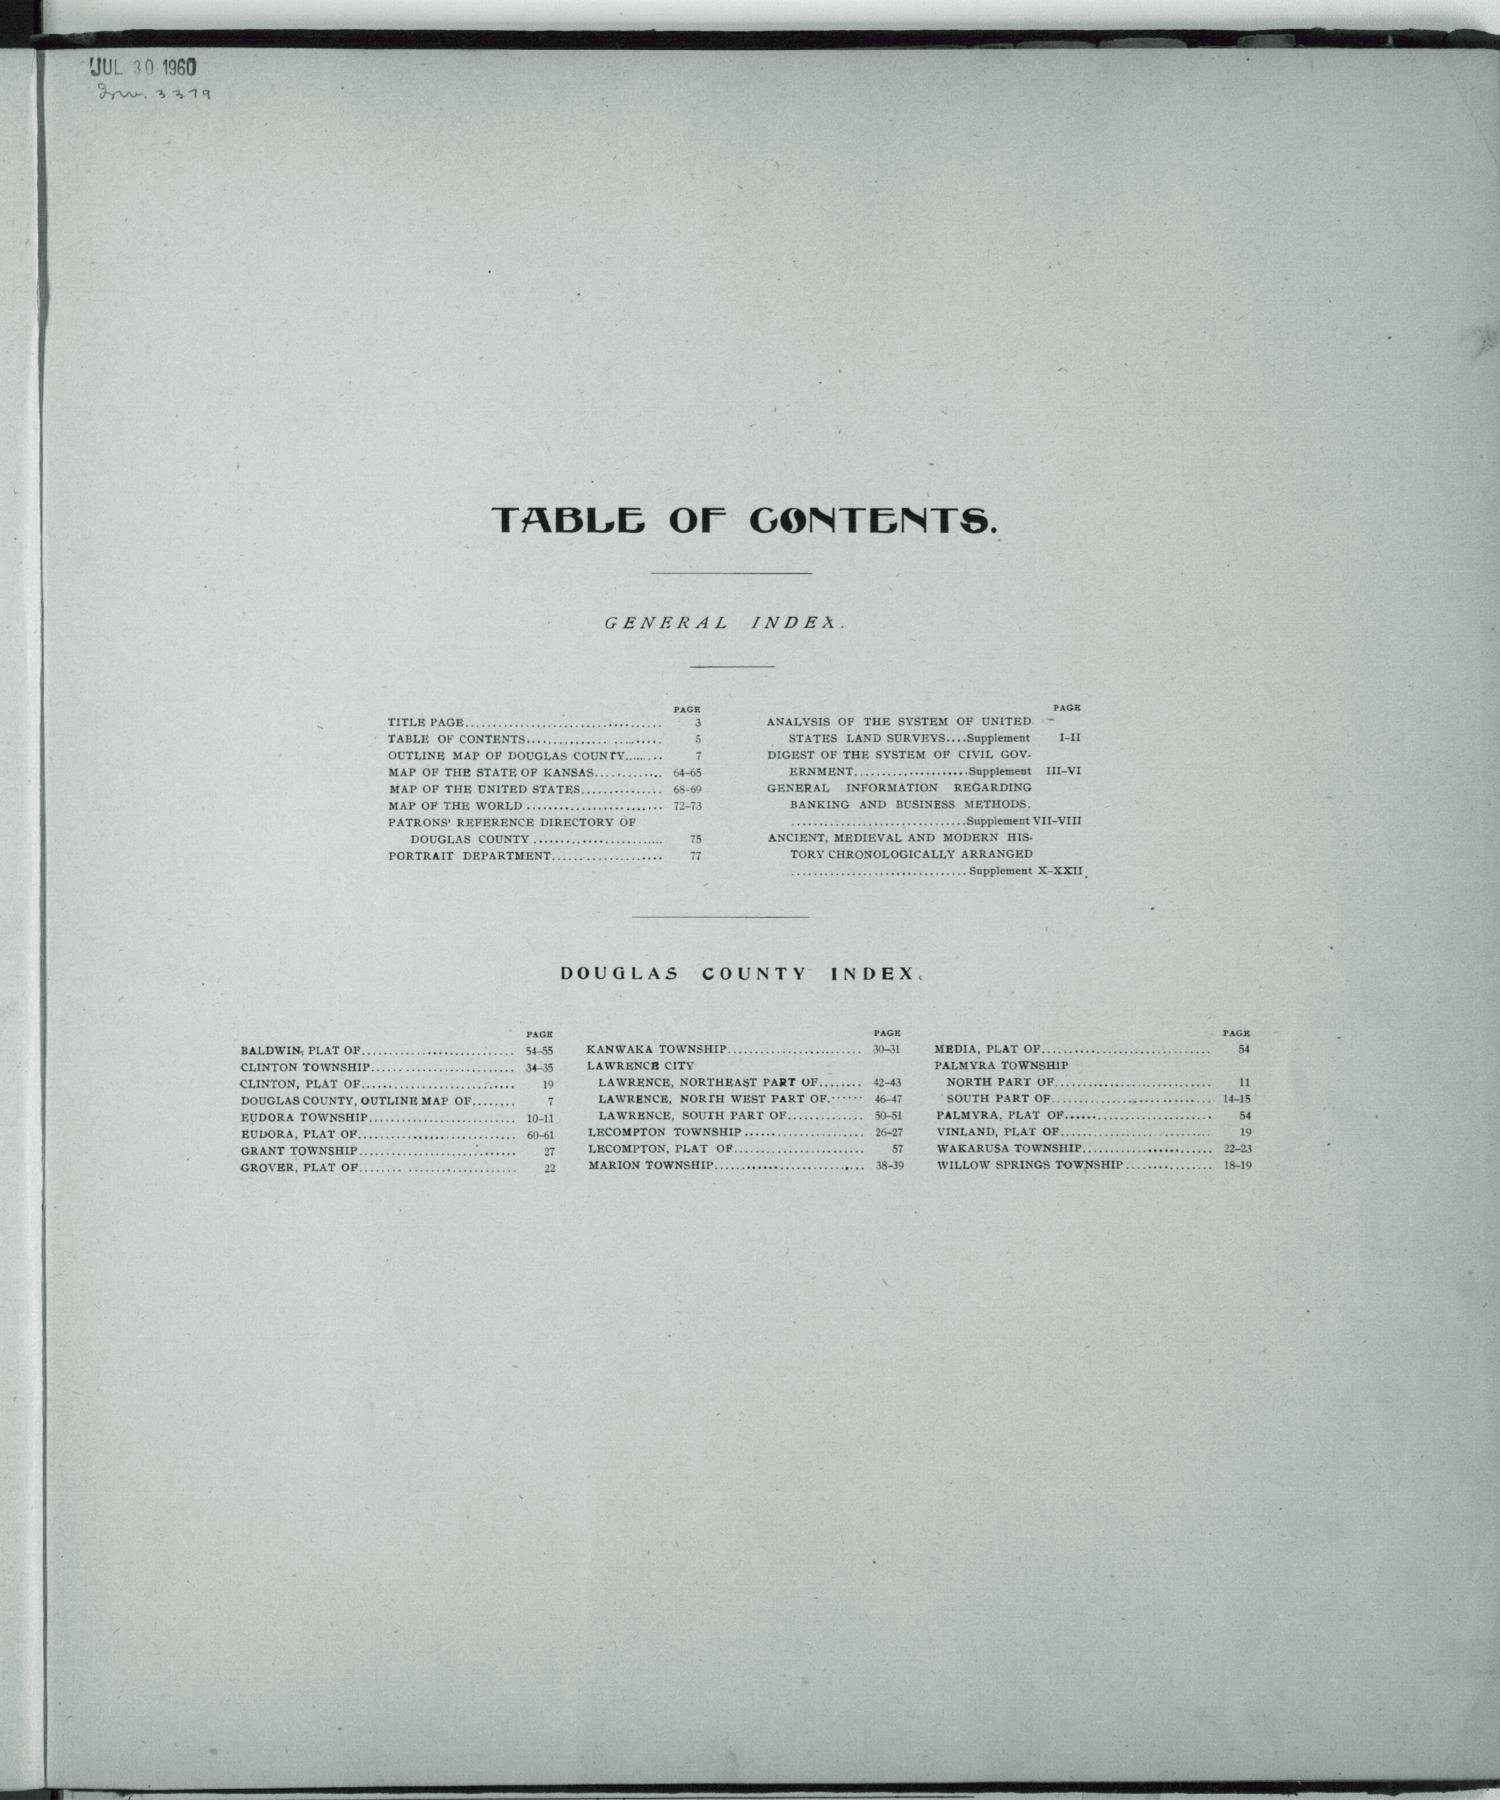 Standard atlas of Douglas County, Kansas - Table of contents